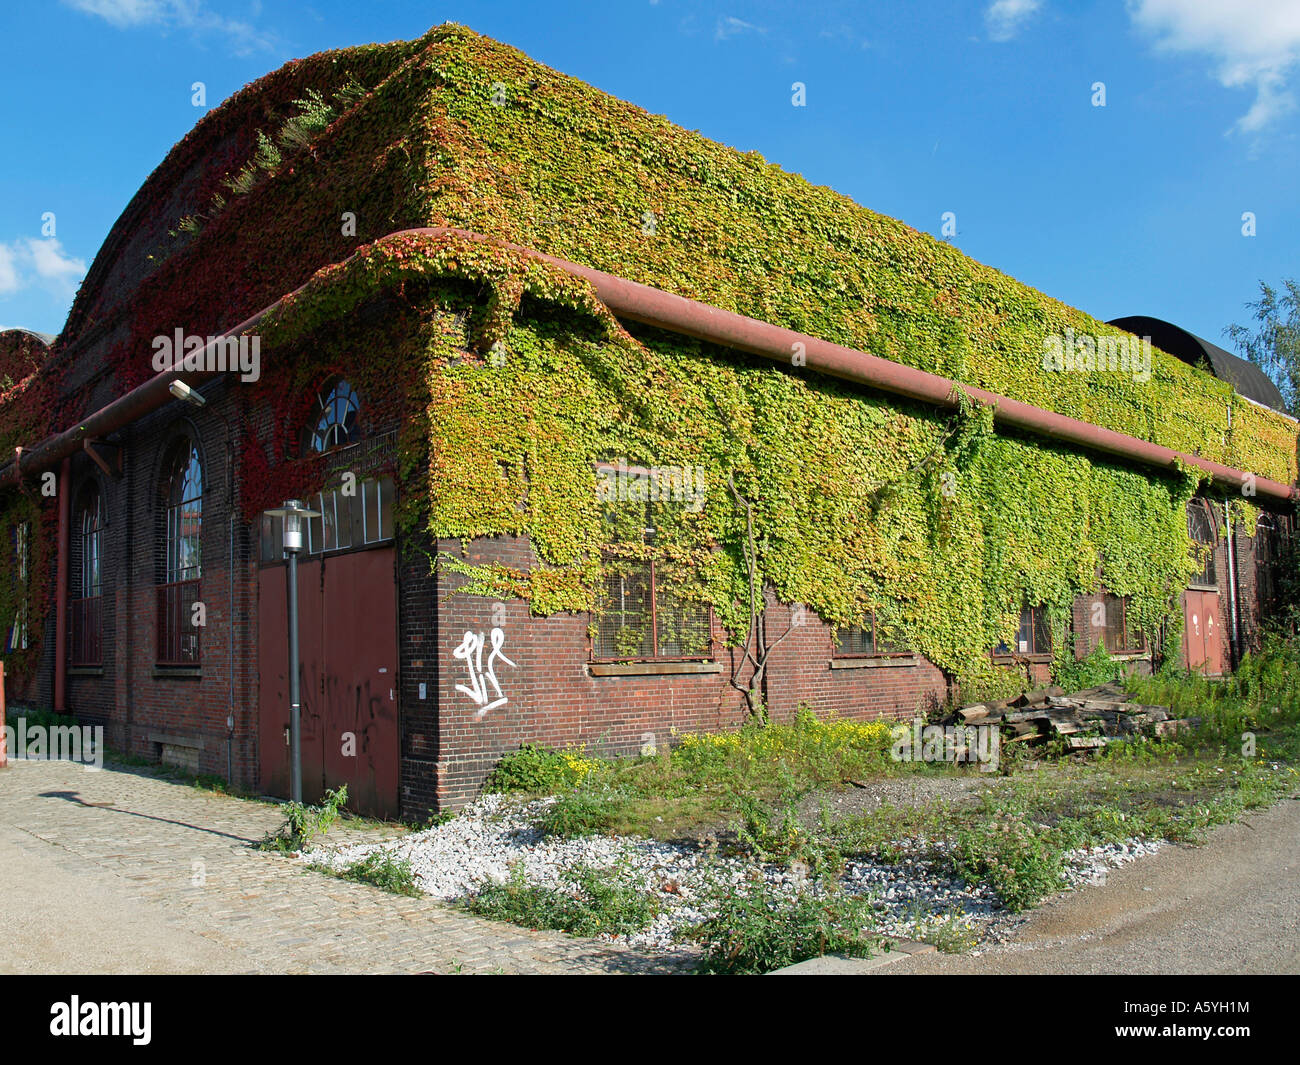 old industrial plants on the area of the Unesco world heritage site mine coal mine Zeche Zollverein in Essen - Stock Image